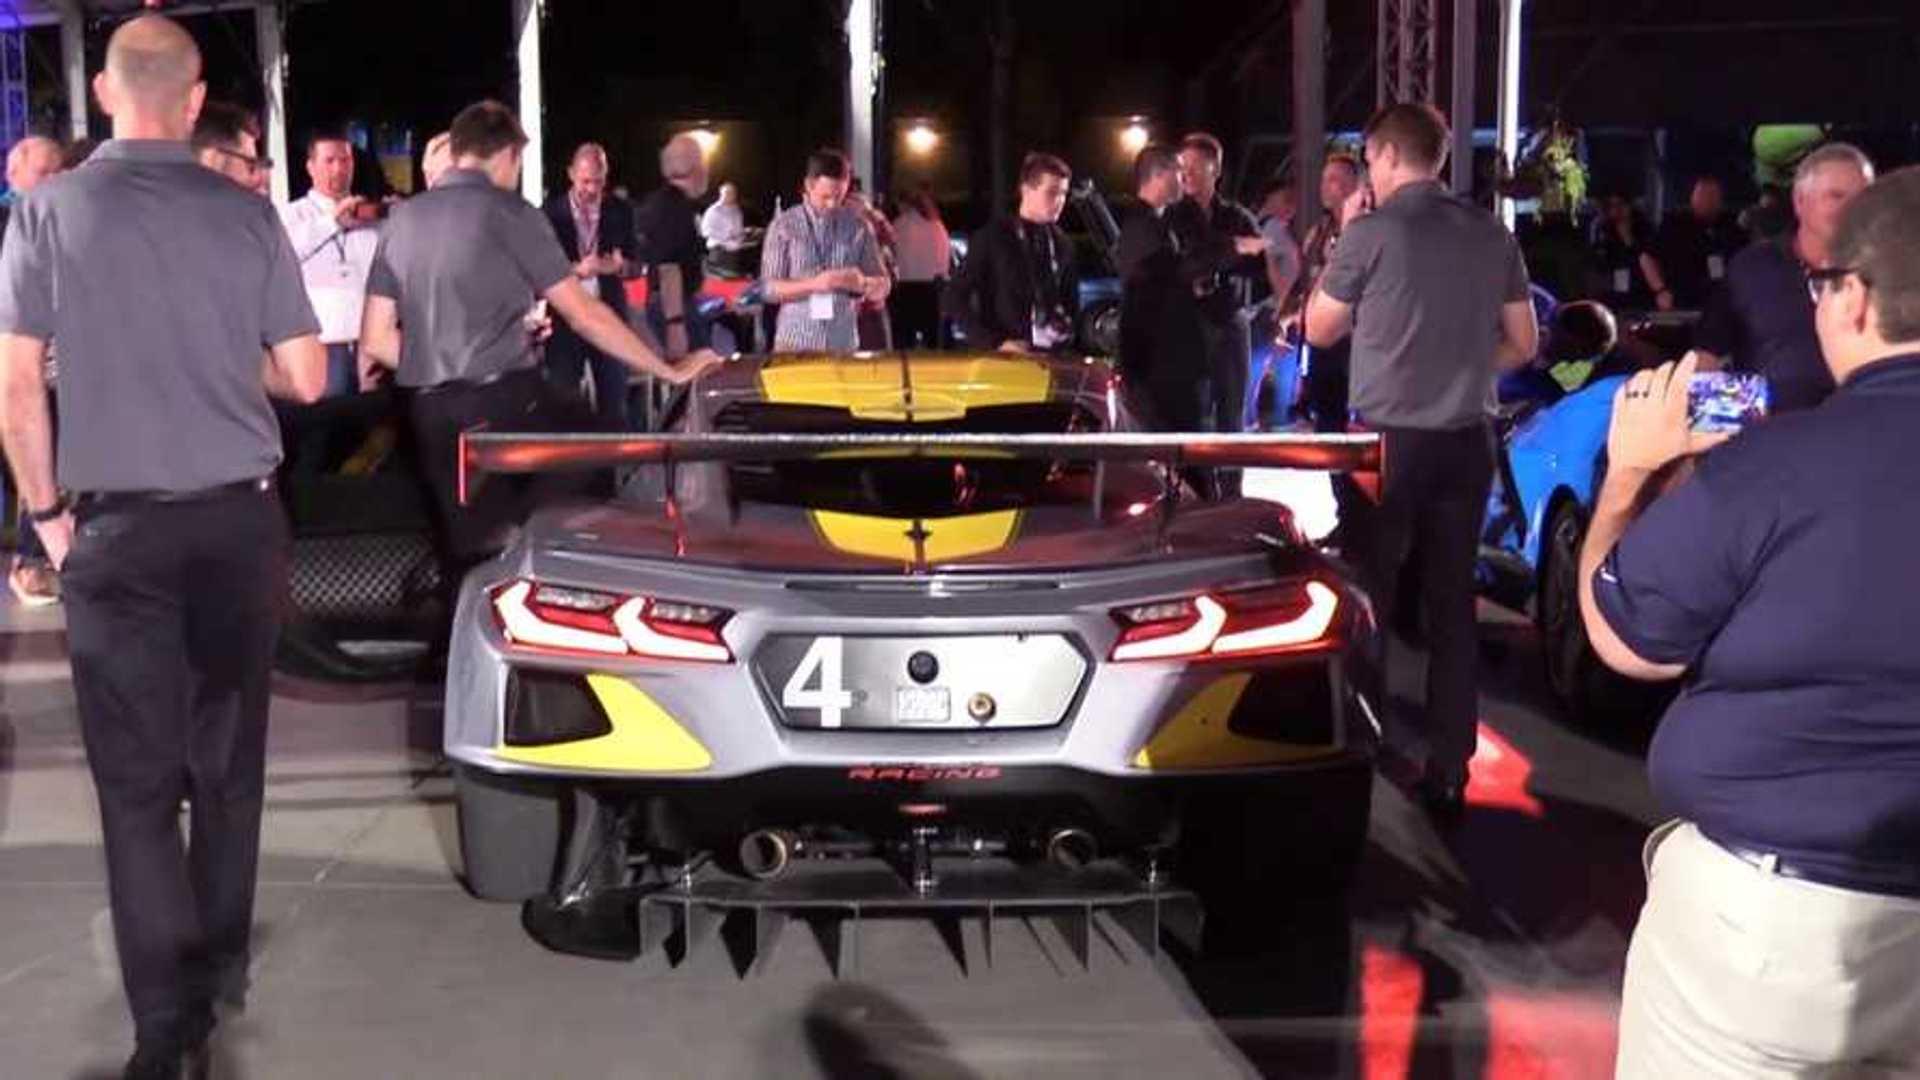 2020 Chevy Corvette C8.R's Race Engine Sounds Like An F1 Car